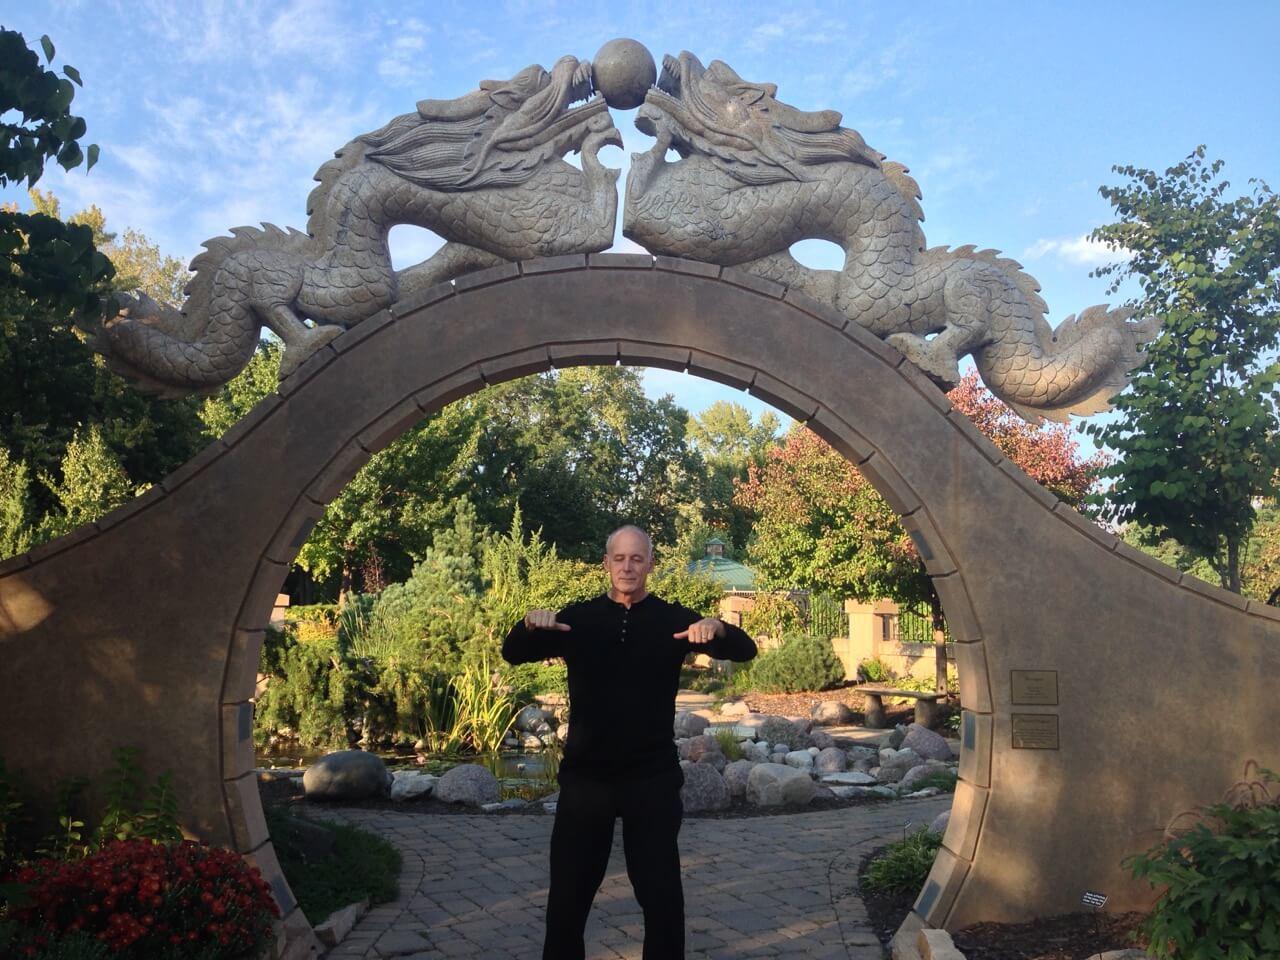 Lacrosse Garden Dragons